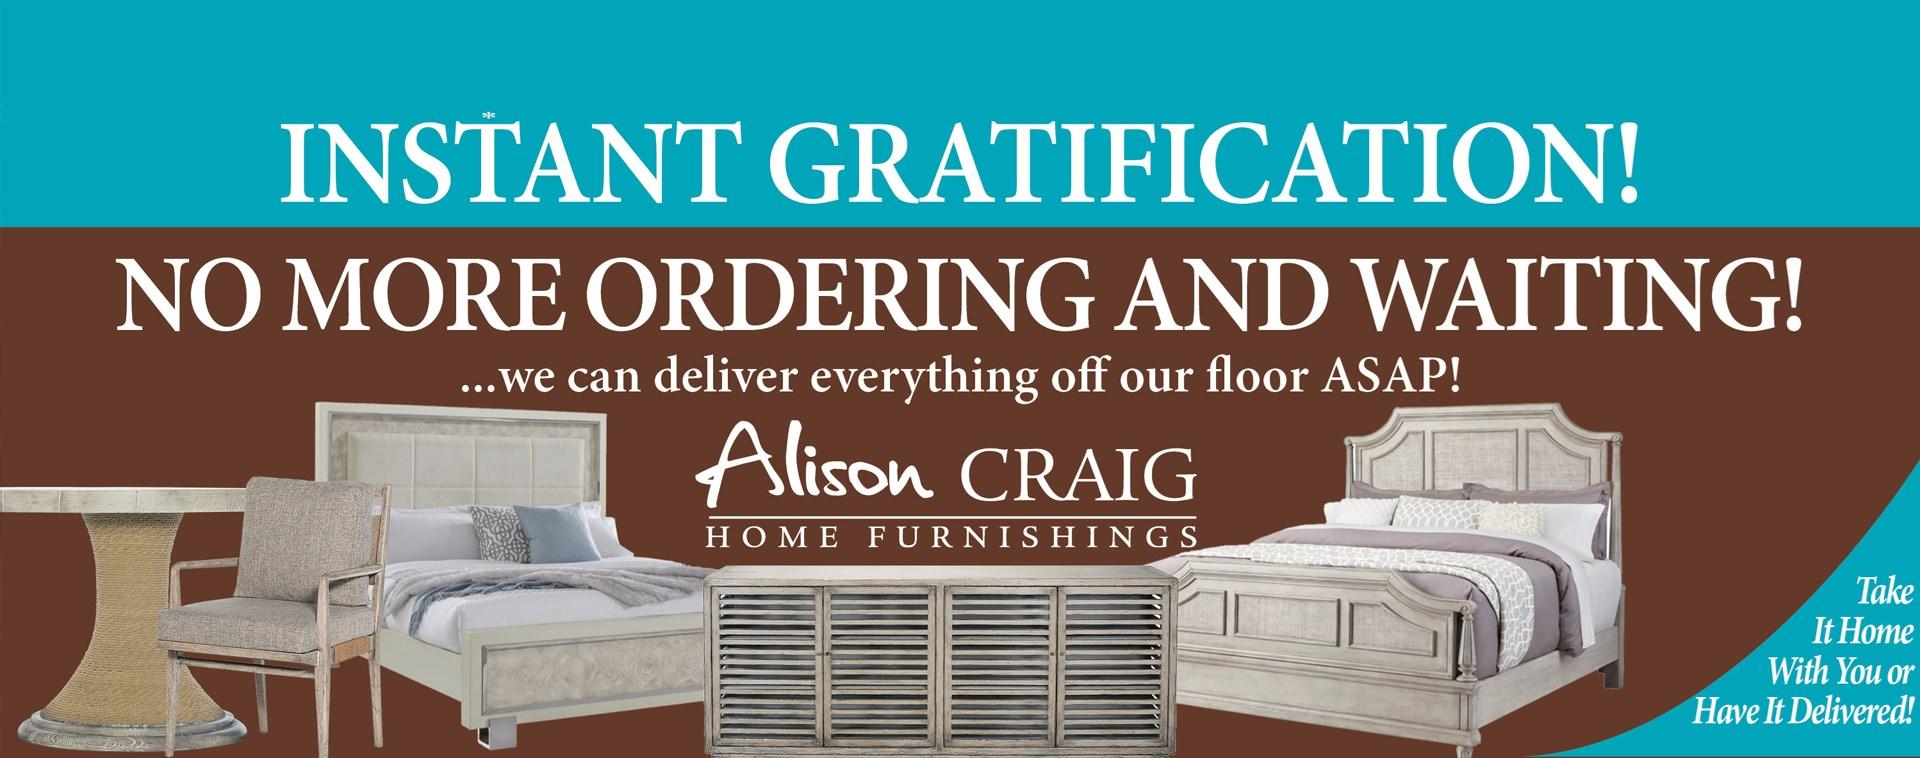 Instant Gratification No Waiting!